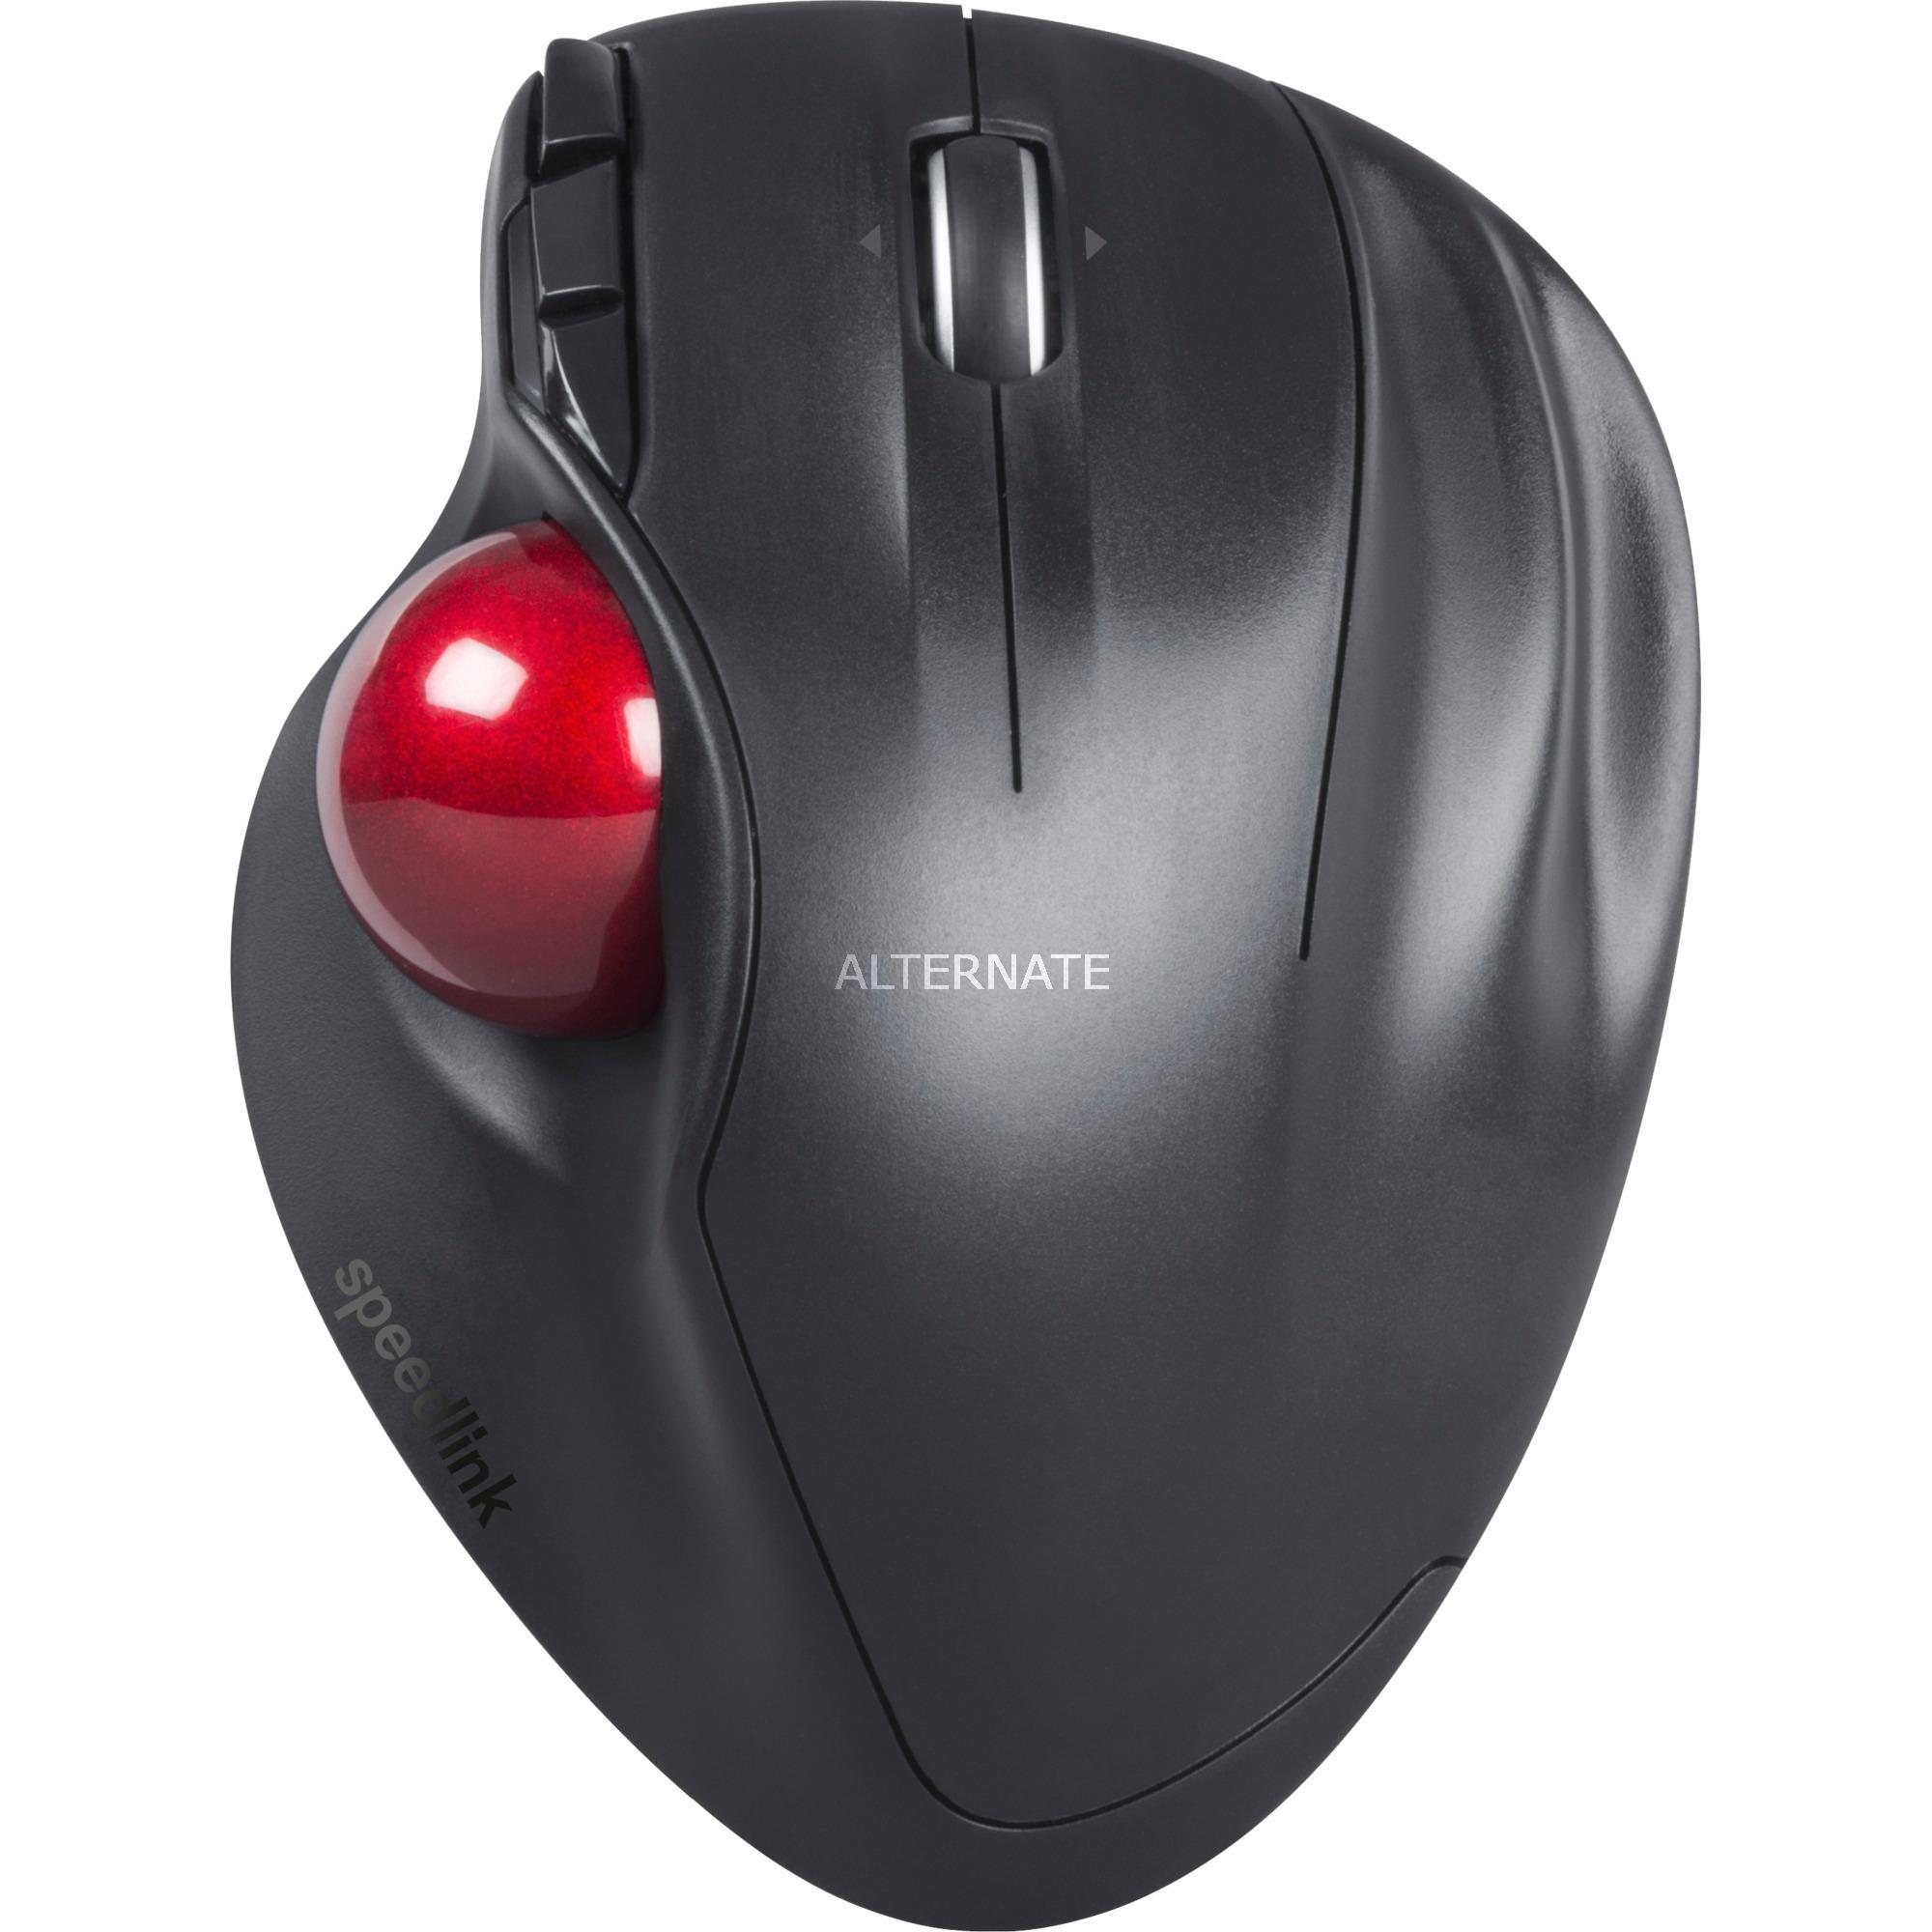 APTICO ratón RF inalámbrico Laser 1600 DPI mano derecha, Trackball